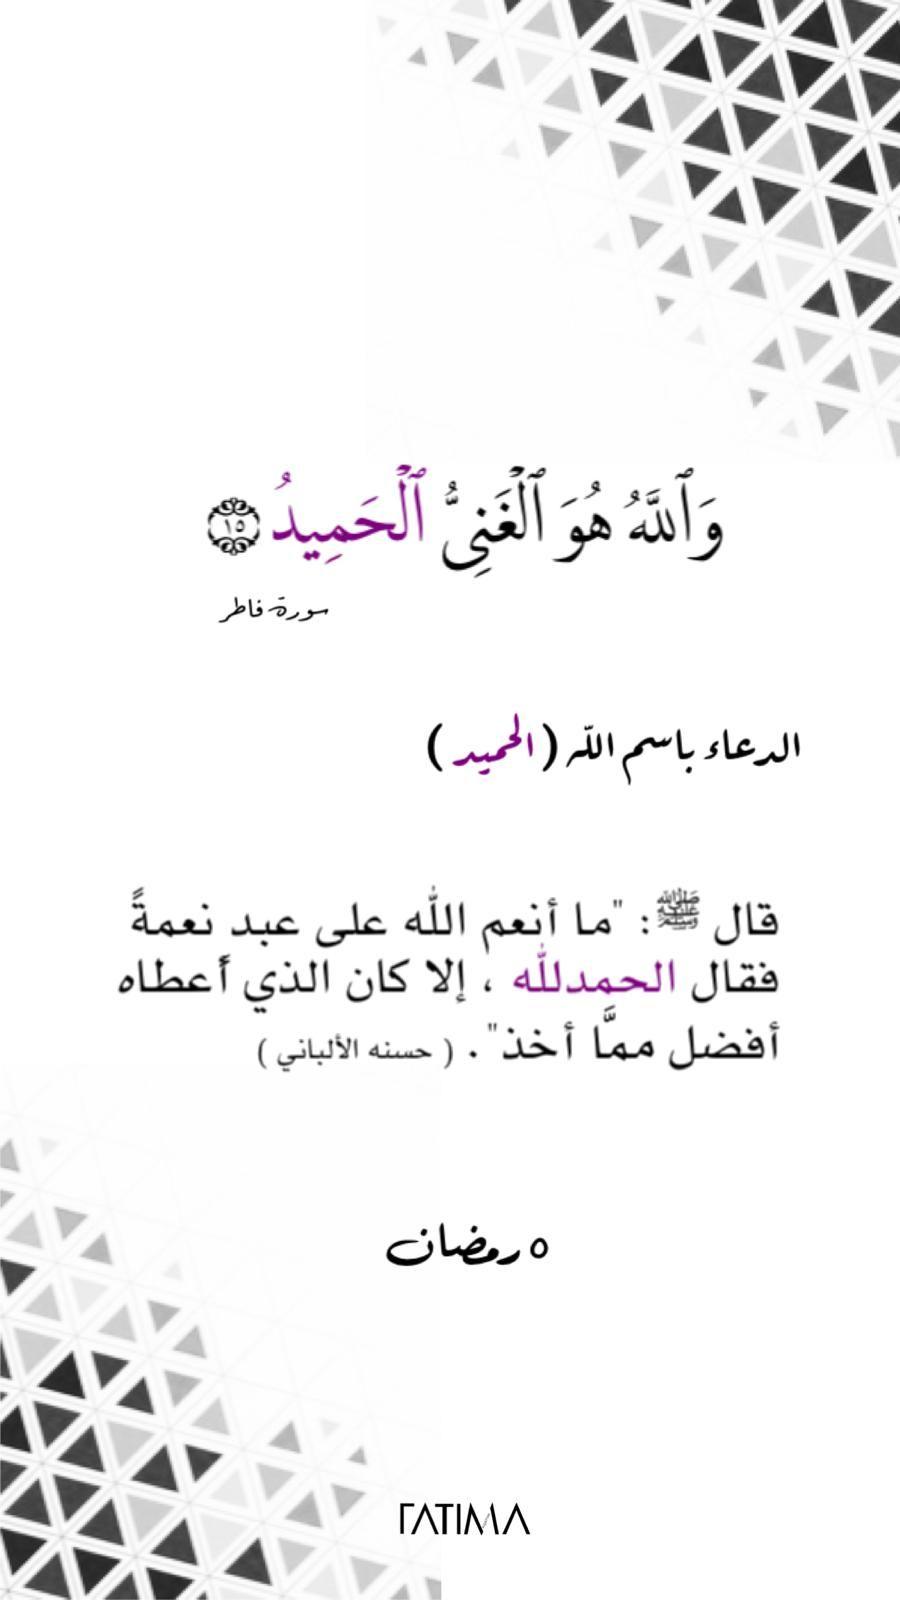 Ramadan Kareem رمضان دعاء ذكر Islamic Information Salaah Islamic Quotes